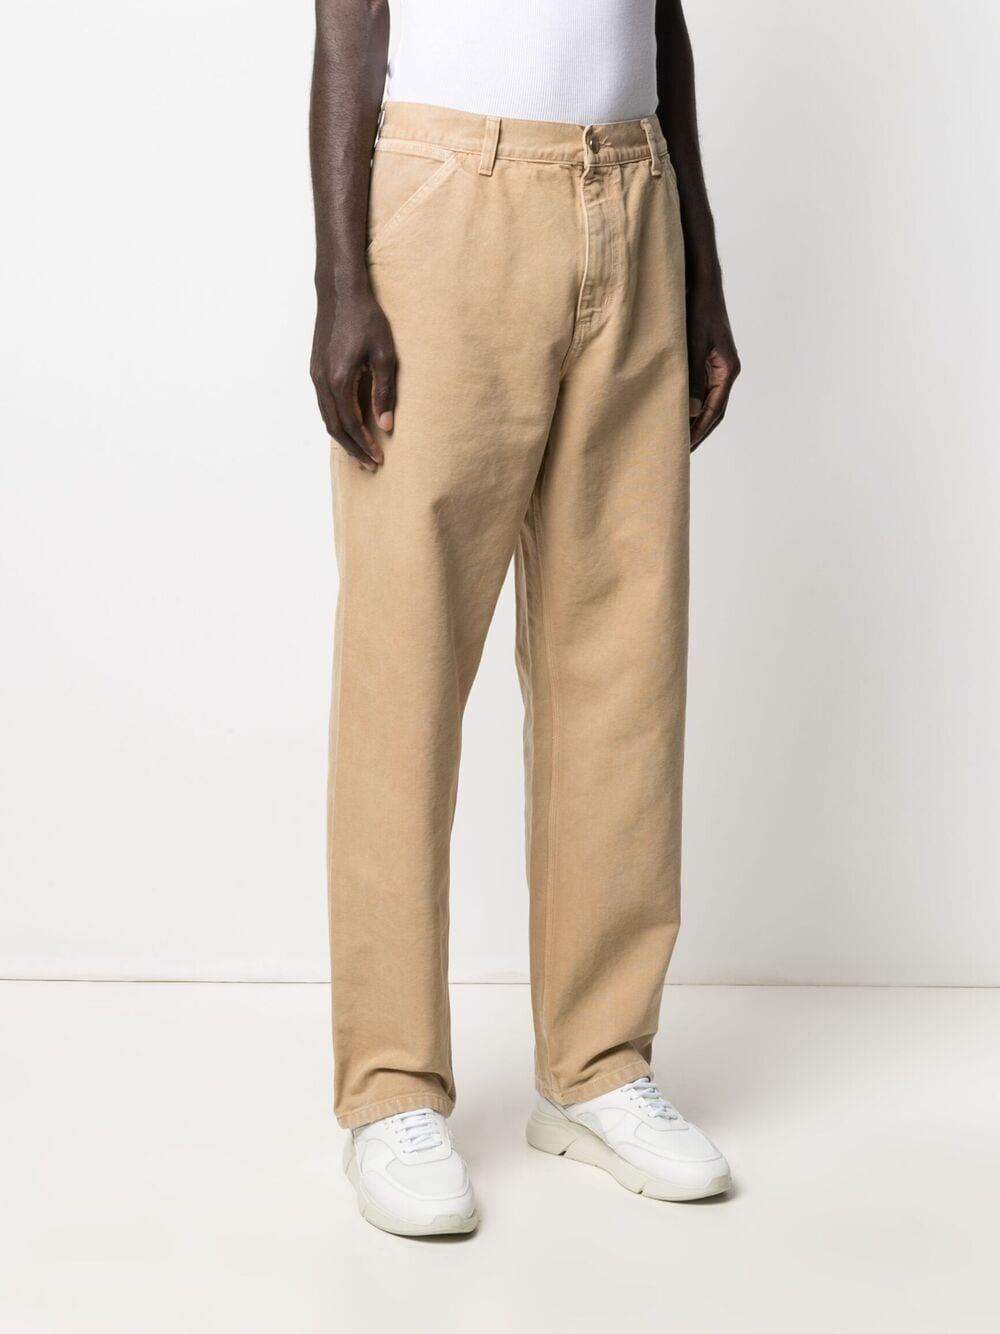 pantaloni single knee uomo beige in cotone CARHARTT WIP   Jeans   I026463.3207E.WF